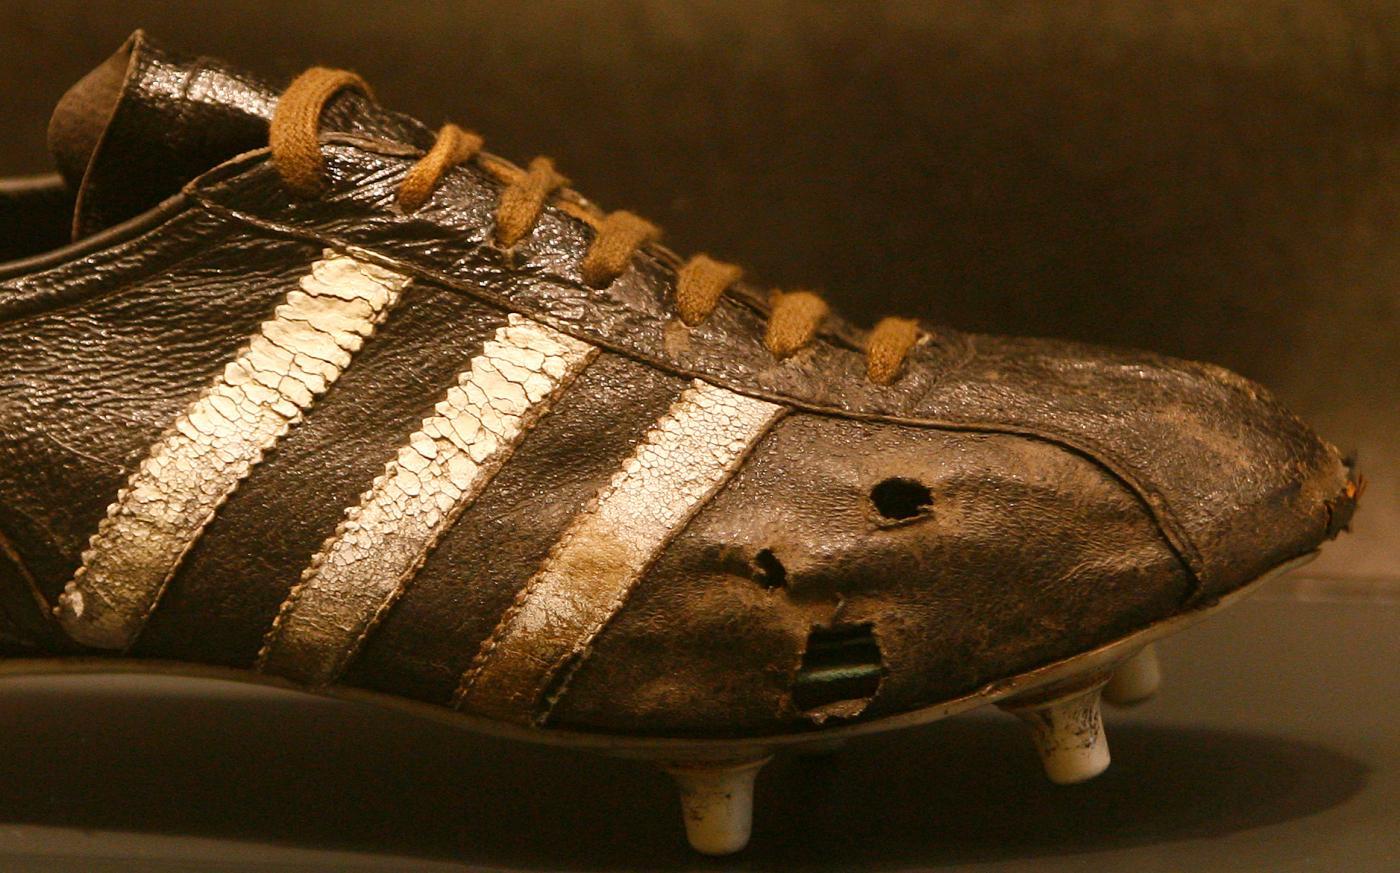 Adidas has sued pretty much everyone who has used stripes.